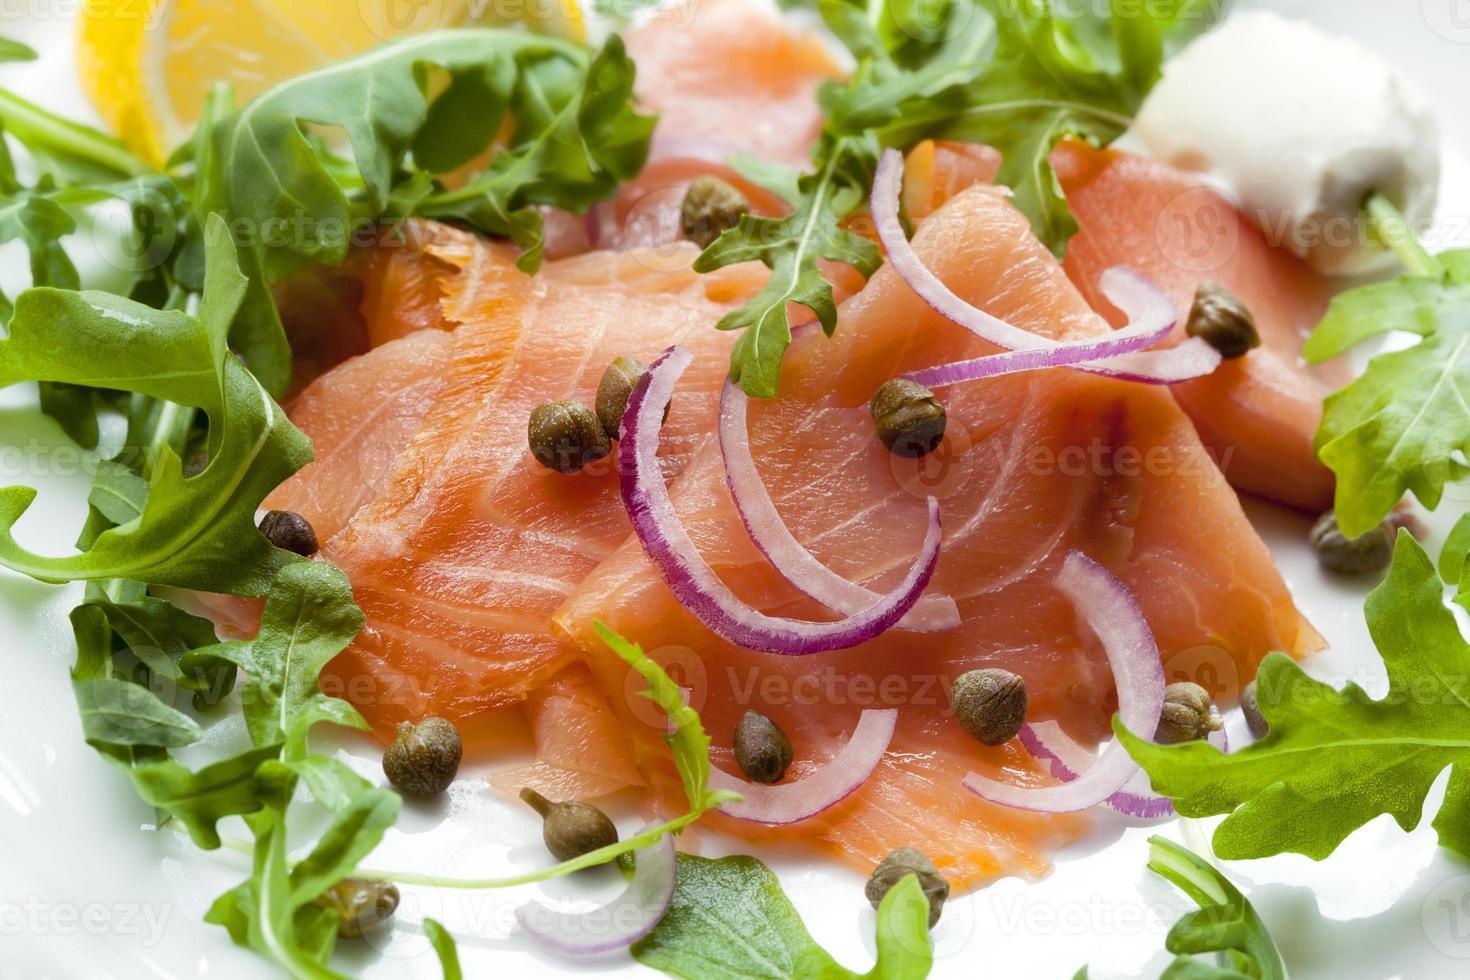 salade met gerookte zalm foto